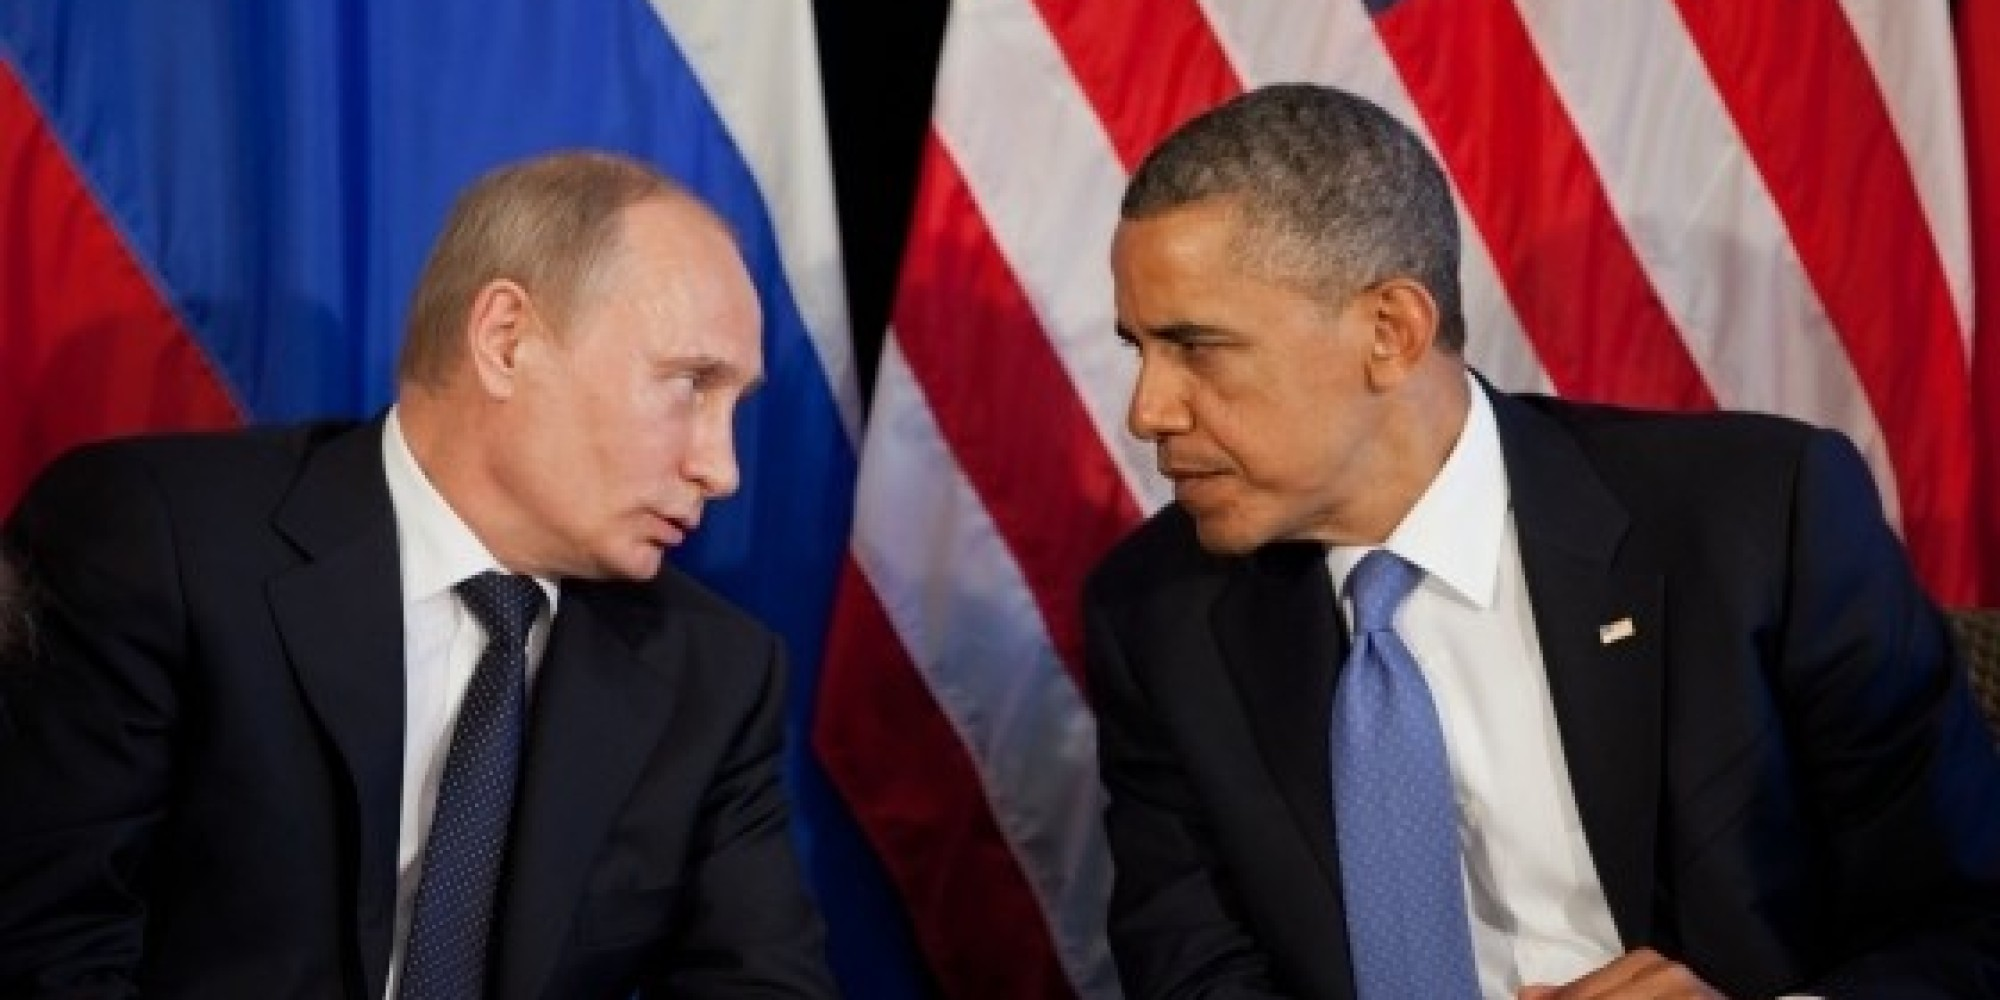 Image result for obama and putin handshake